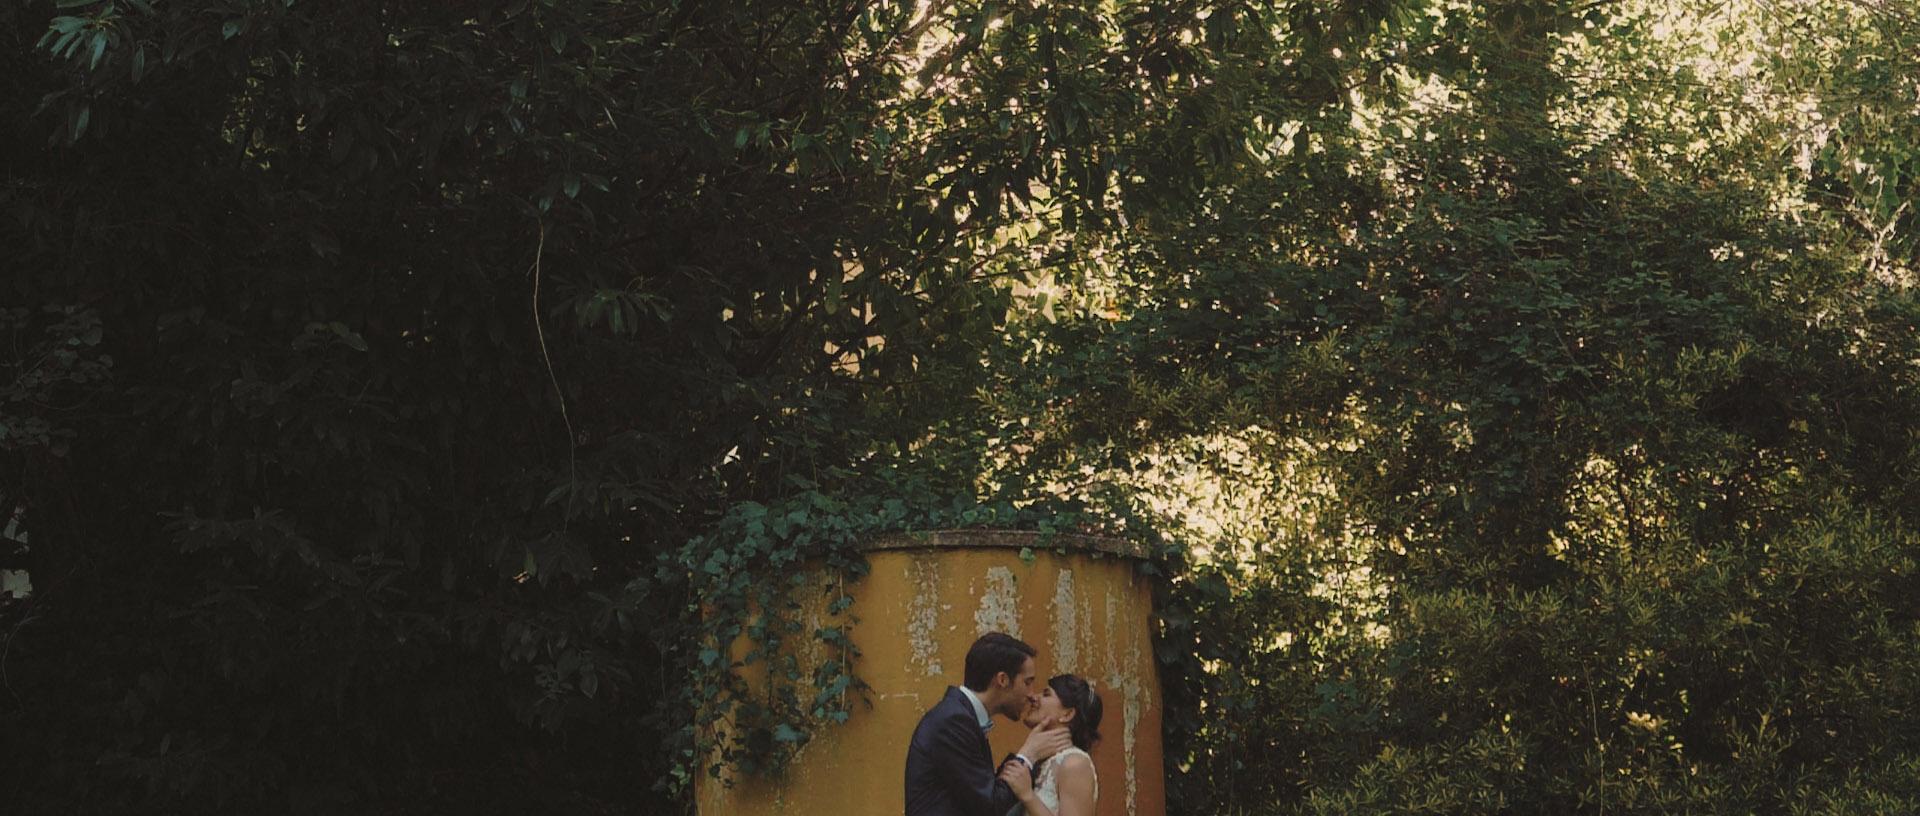 Cristina & José - Wedding